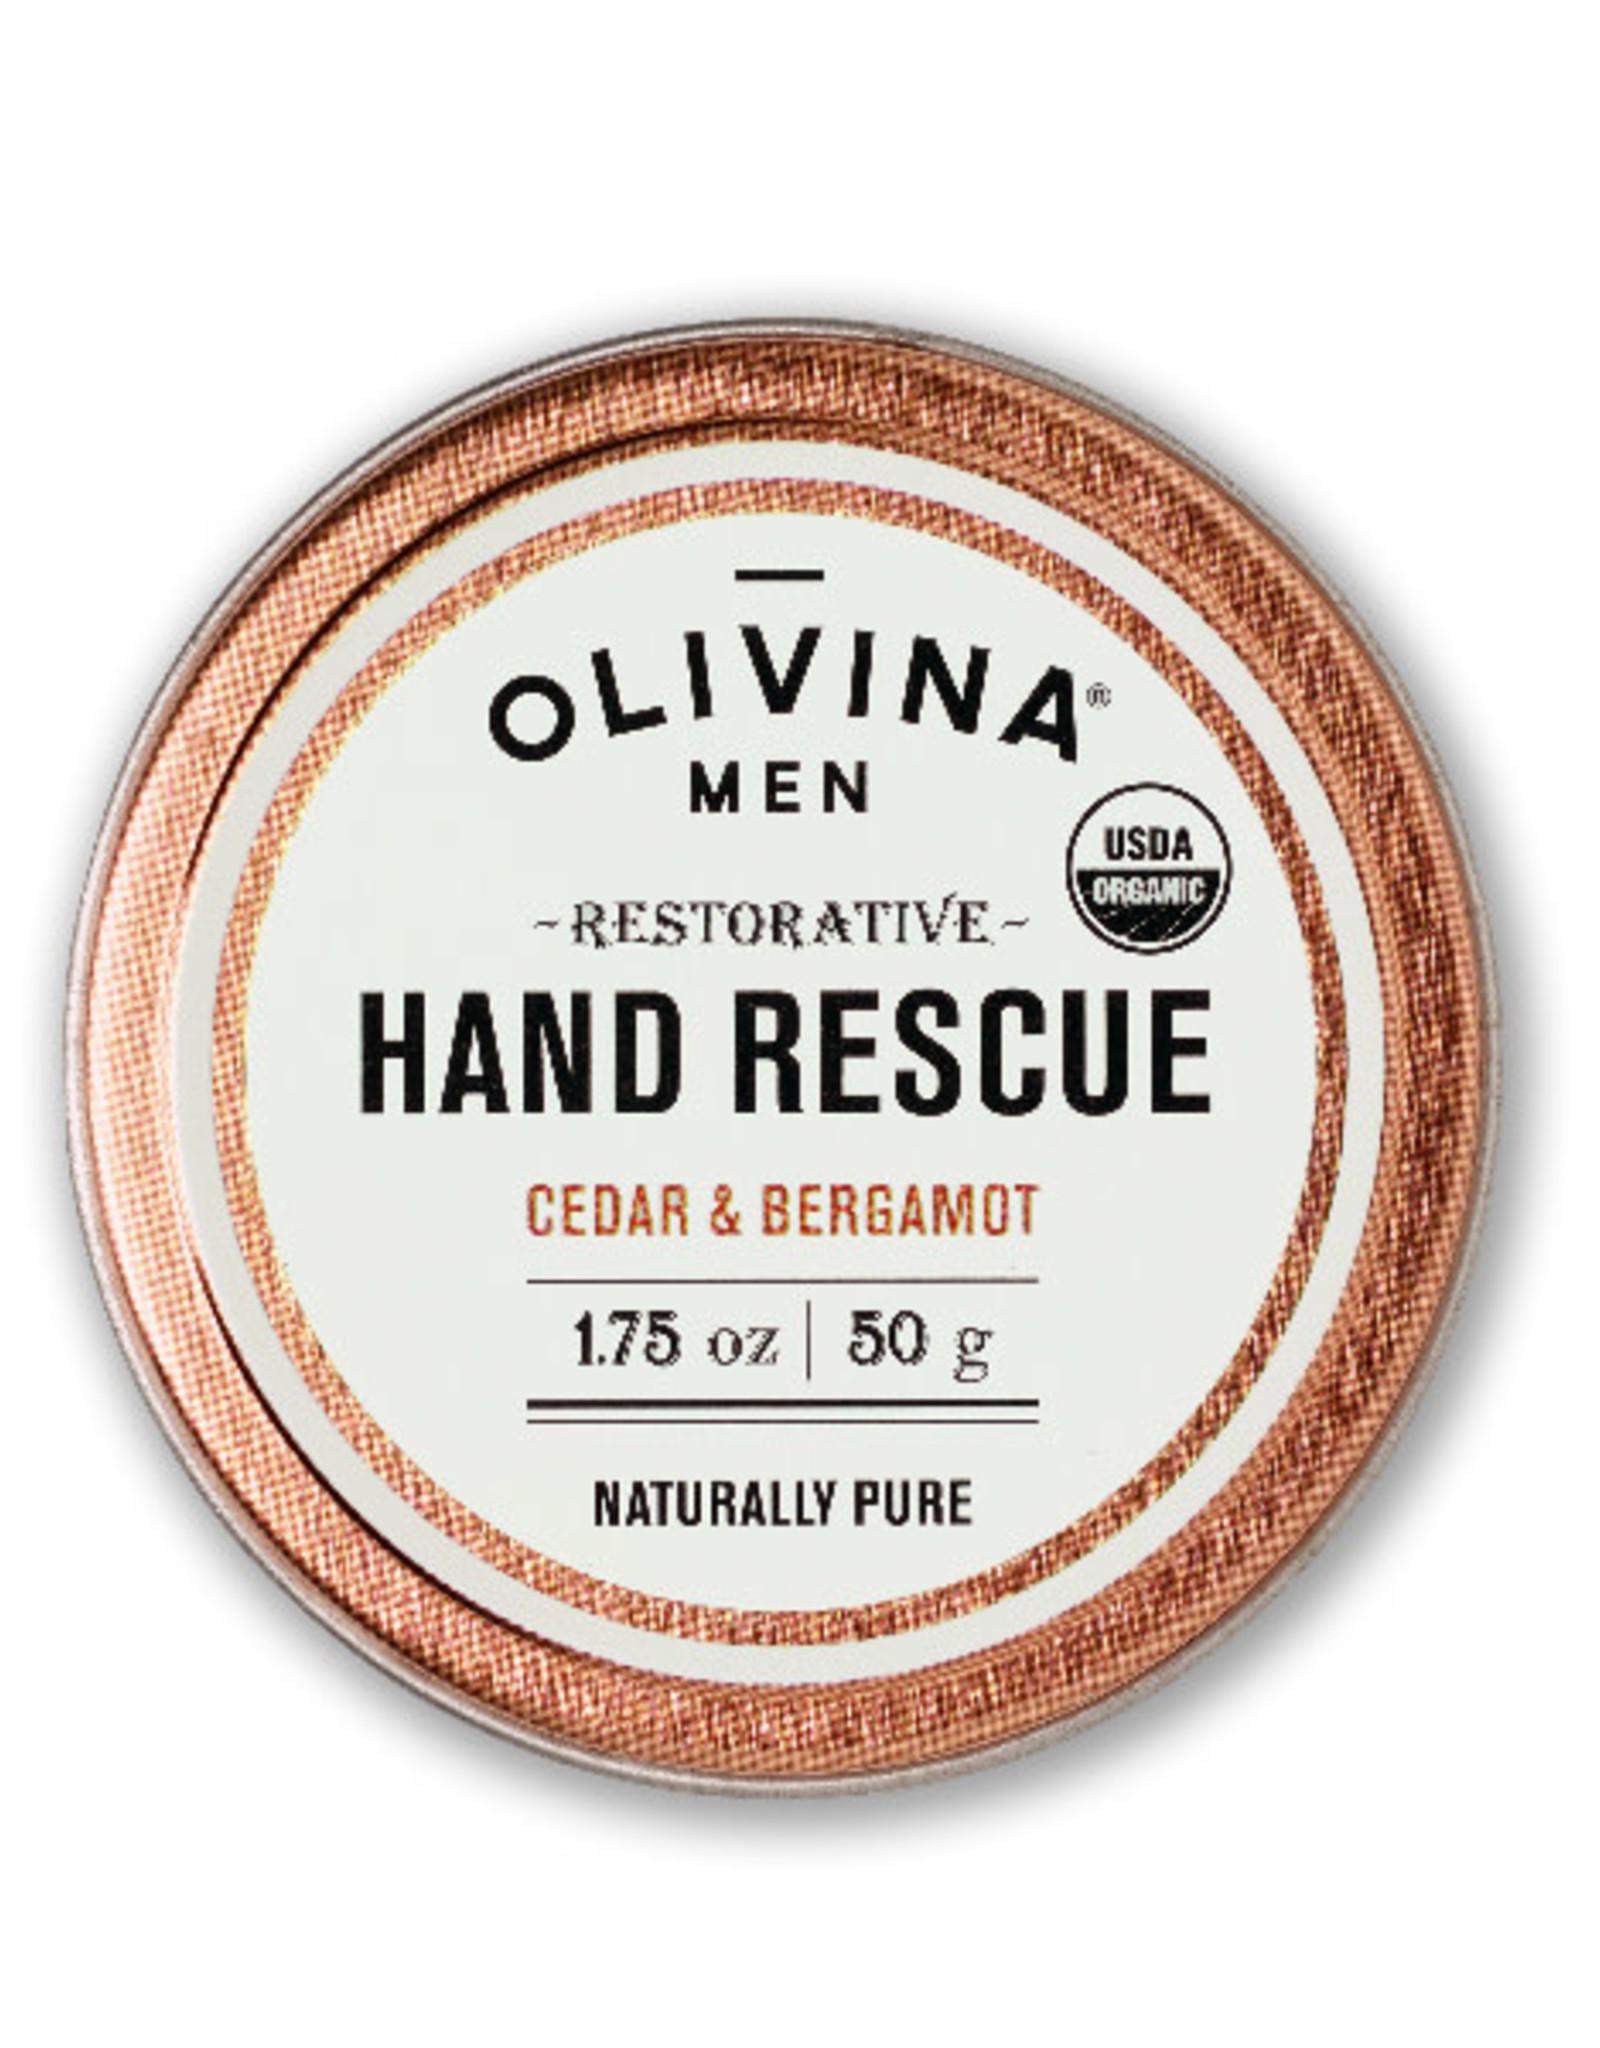 Cedar & Bergamot Hand Rescue